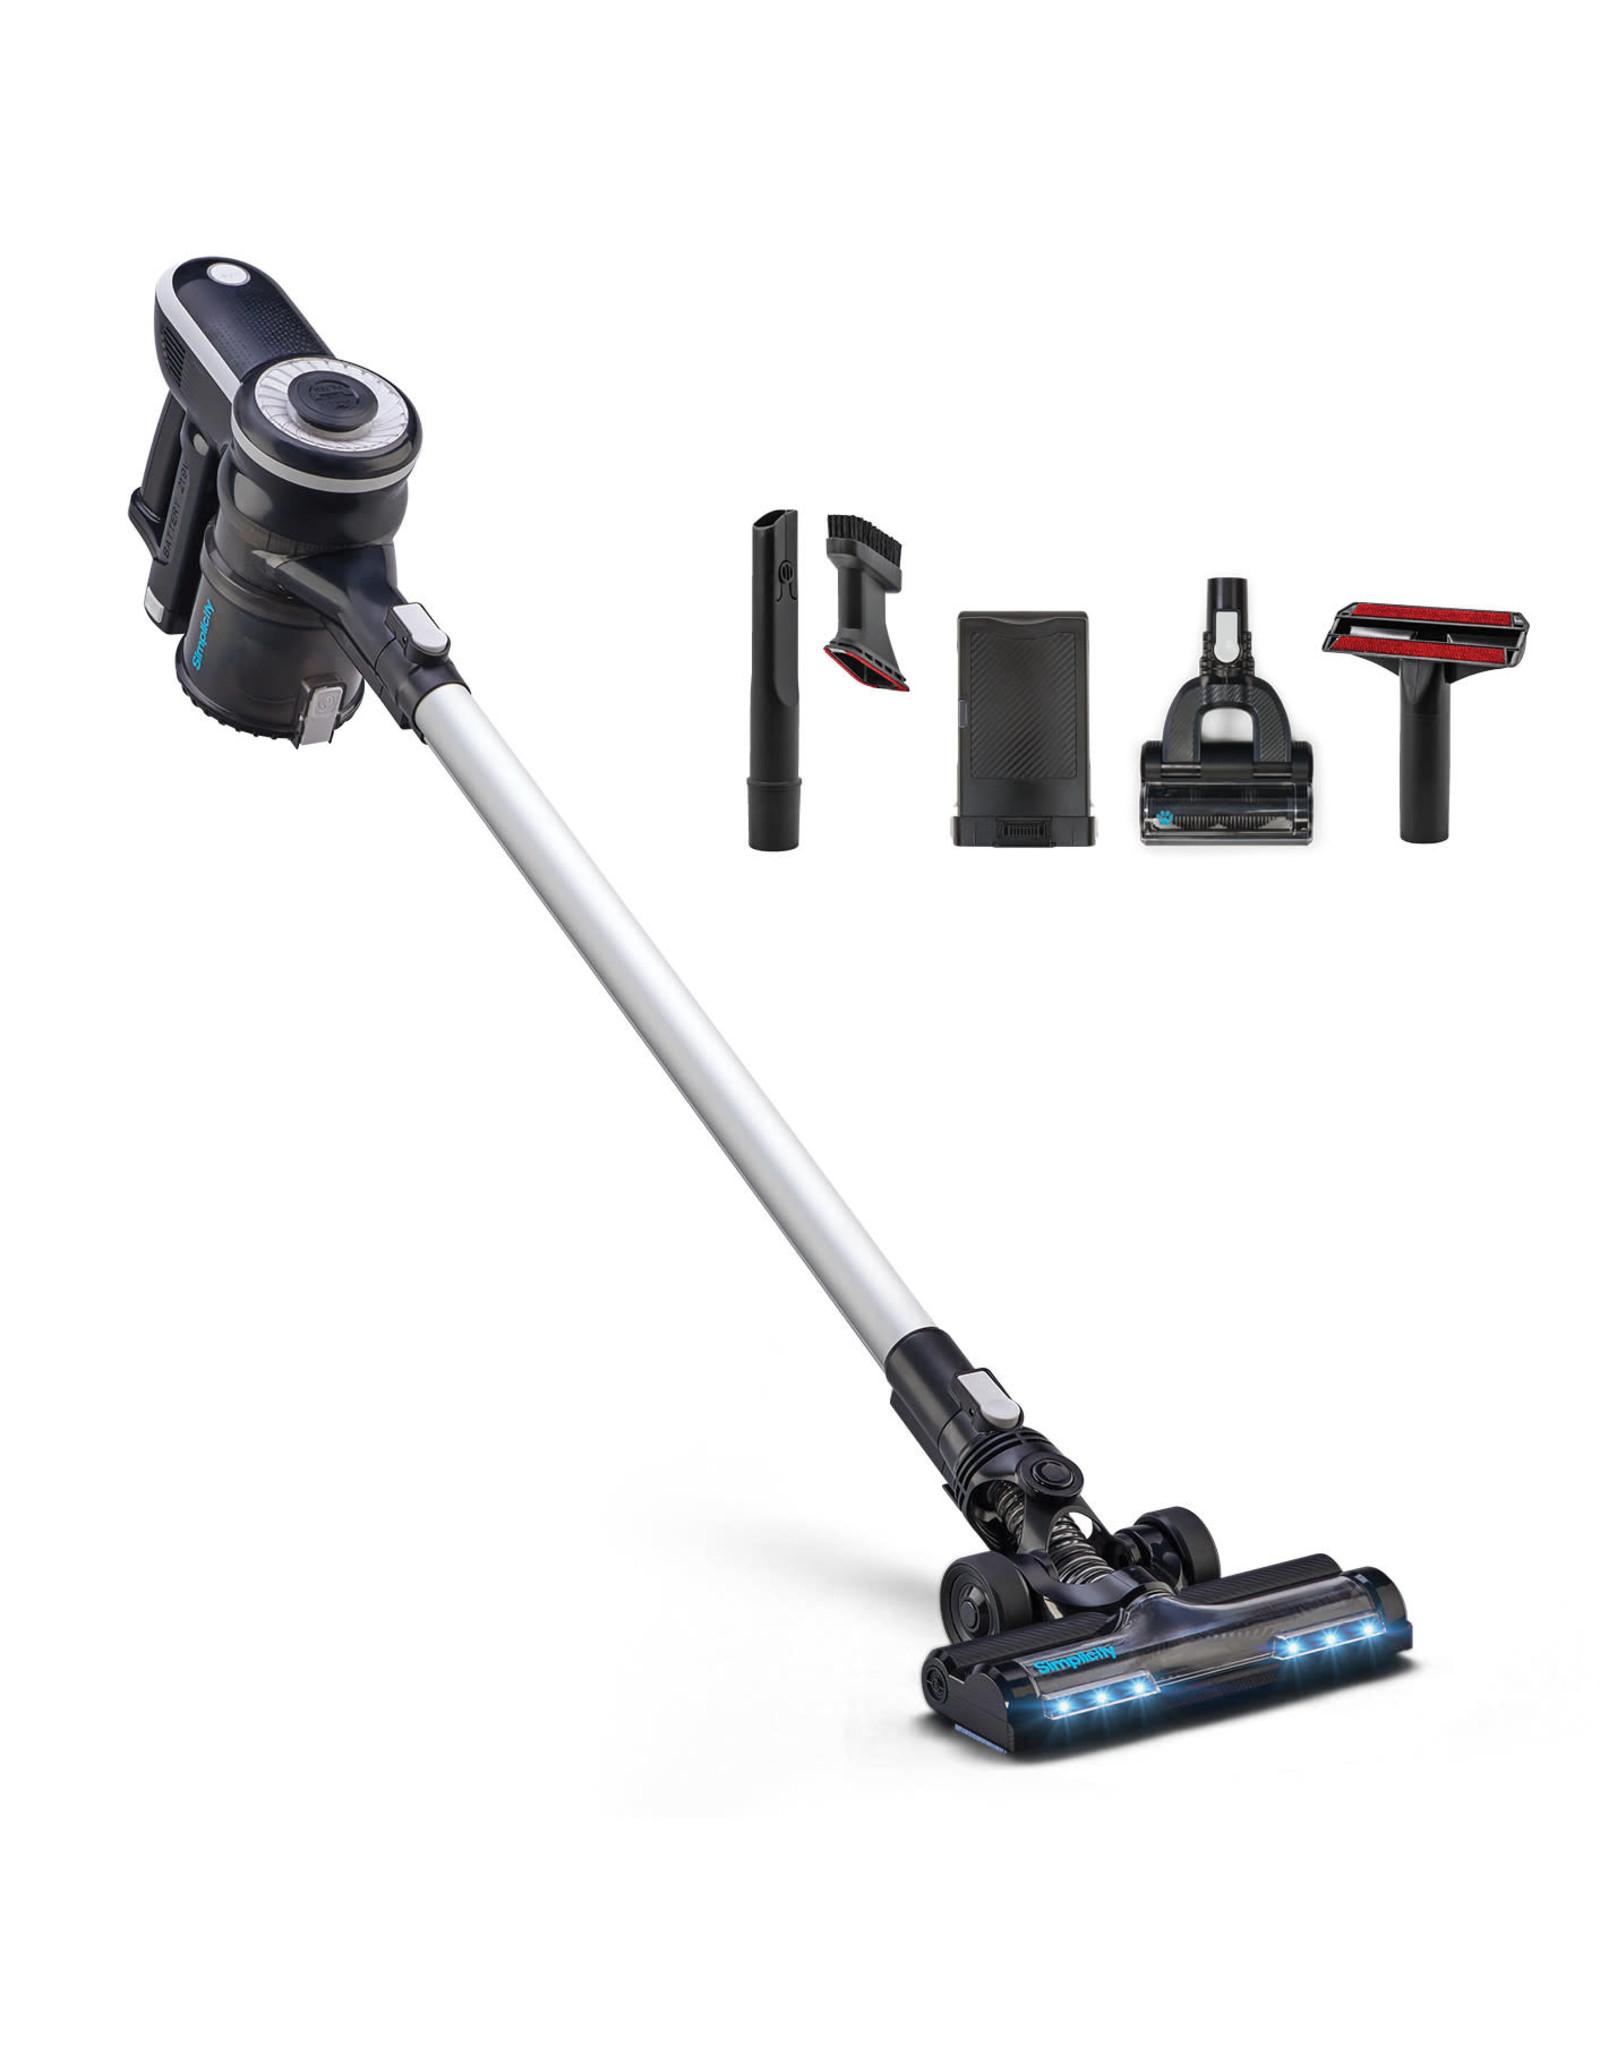 Simplicity Simplicity S65 Deluxe Cordless Vacuum